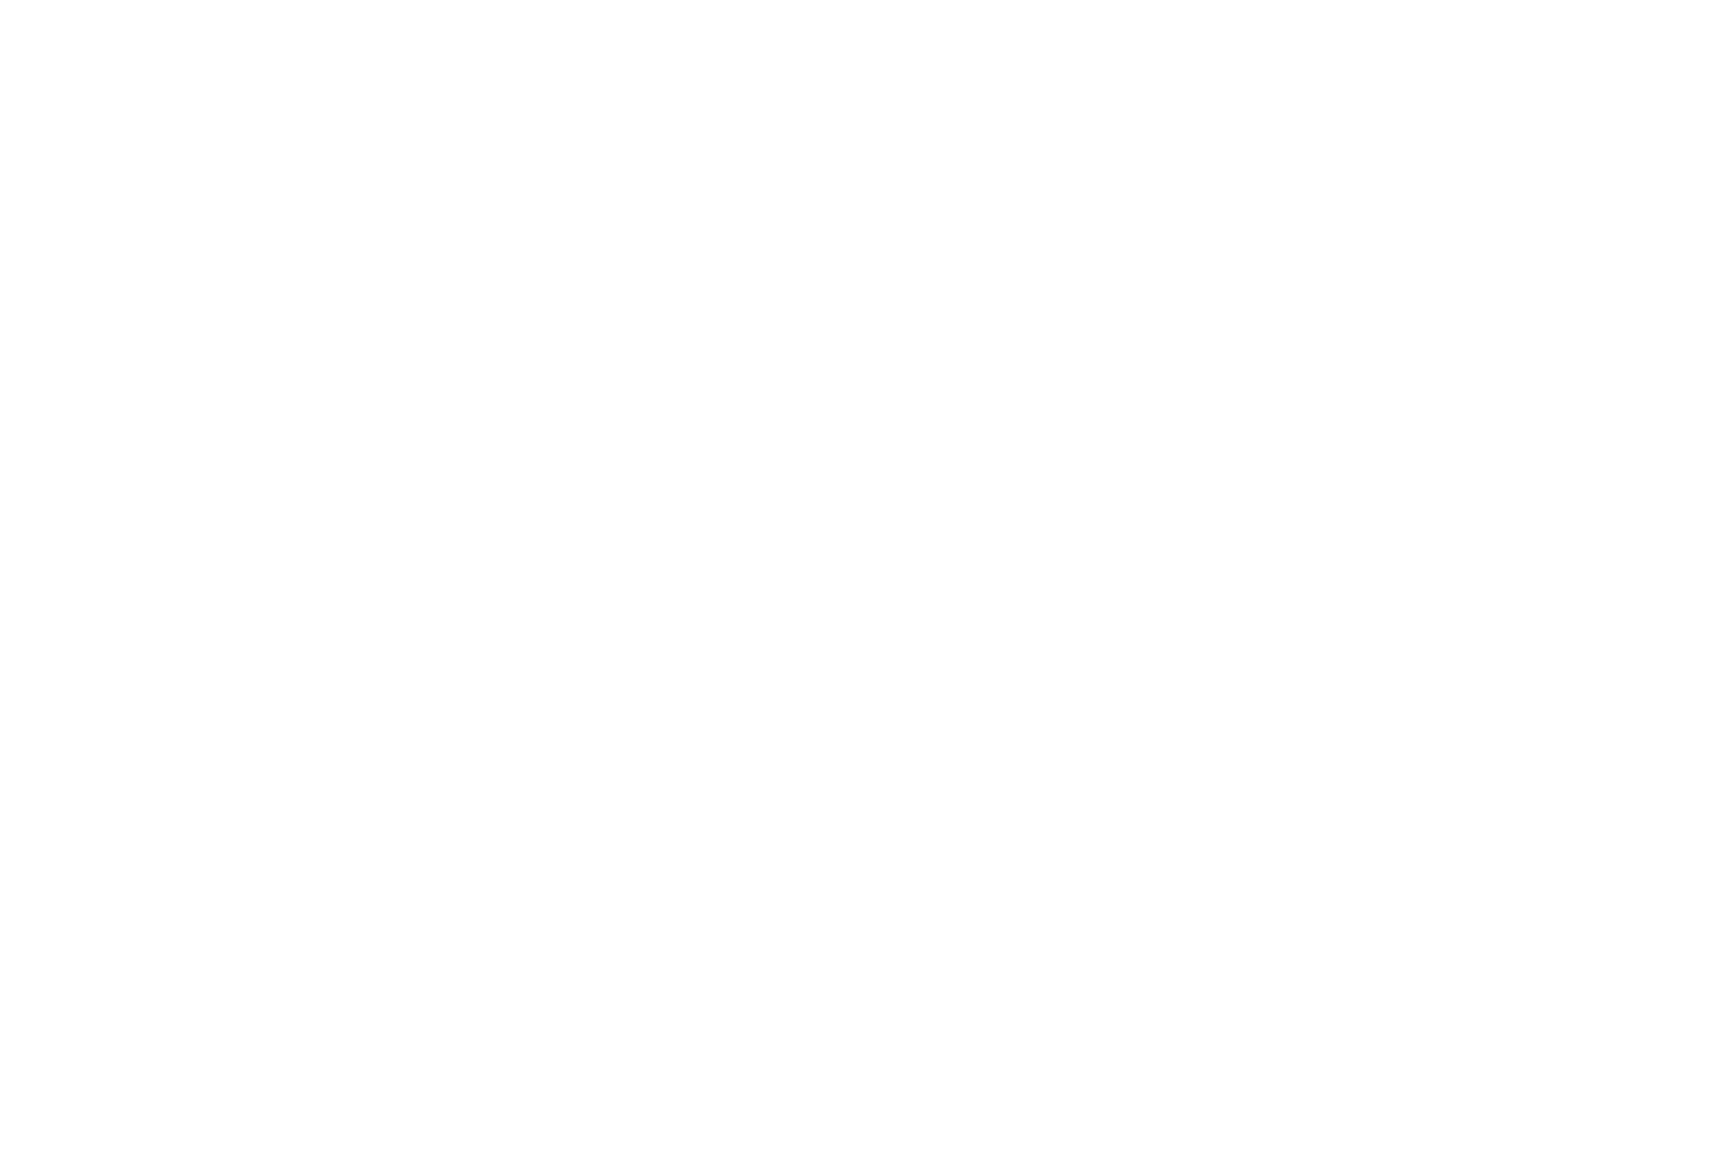 Semi-Finalist - Universal Film Festival - 2021